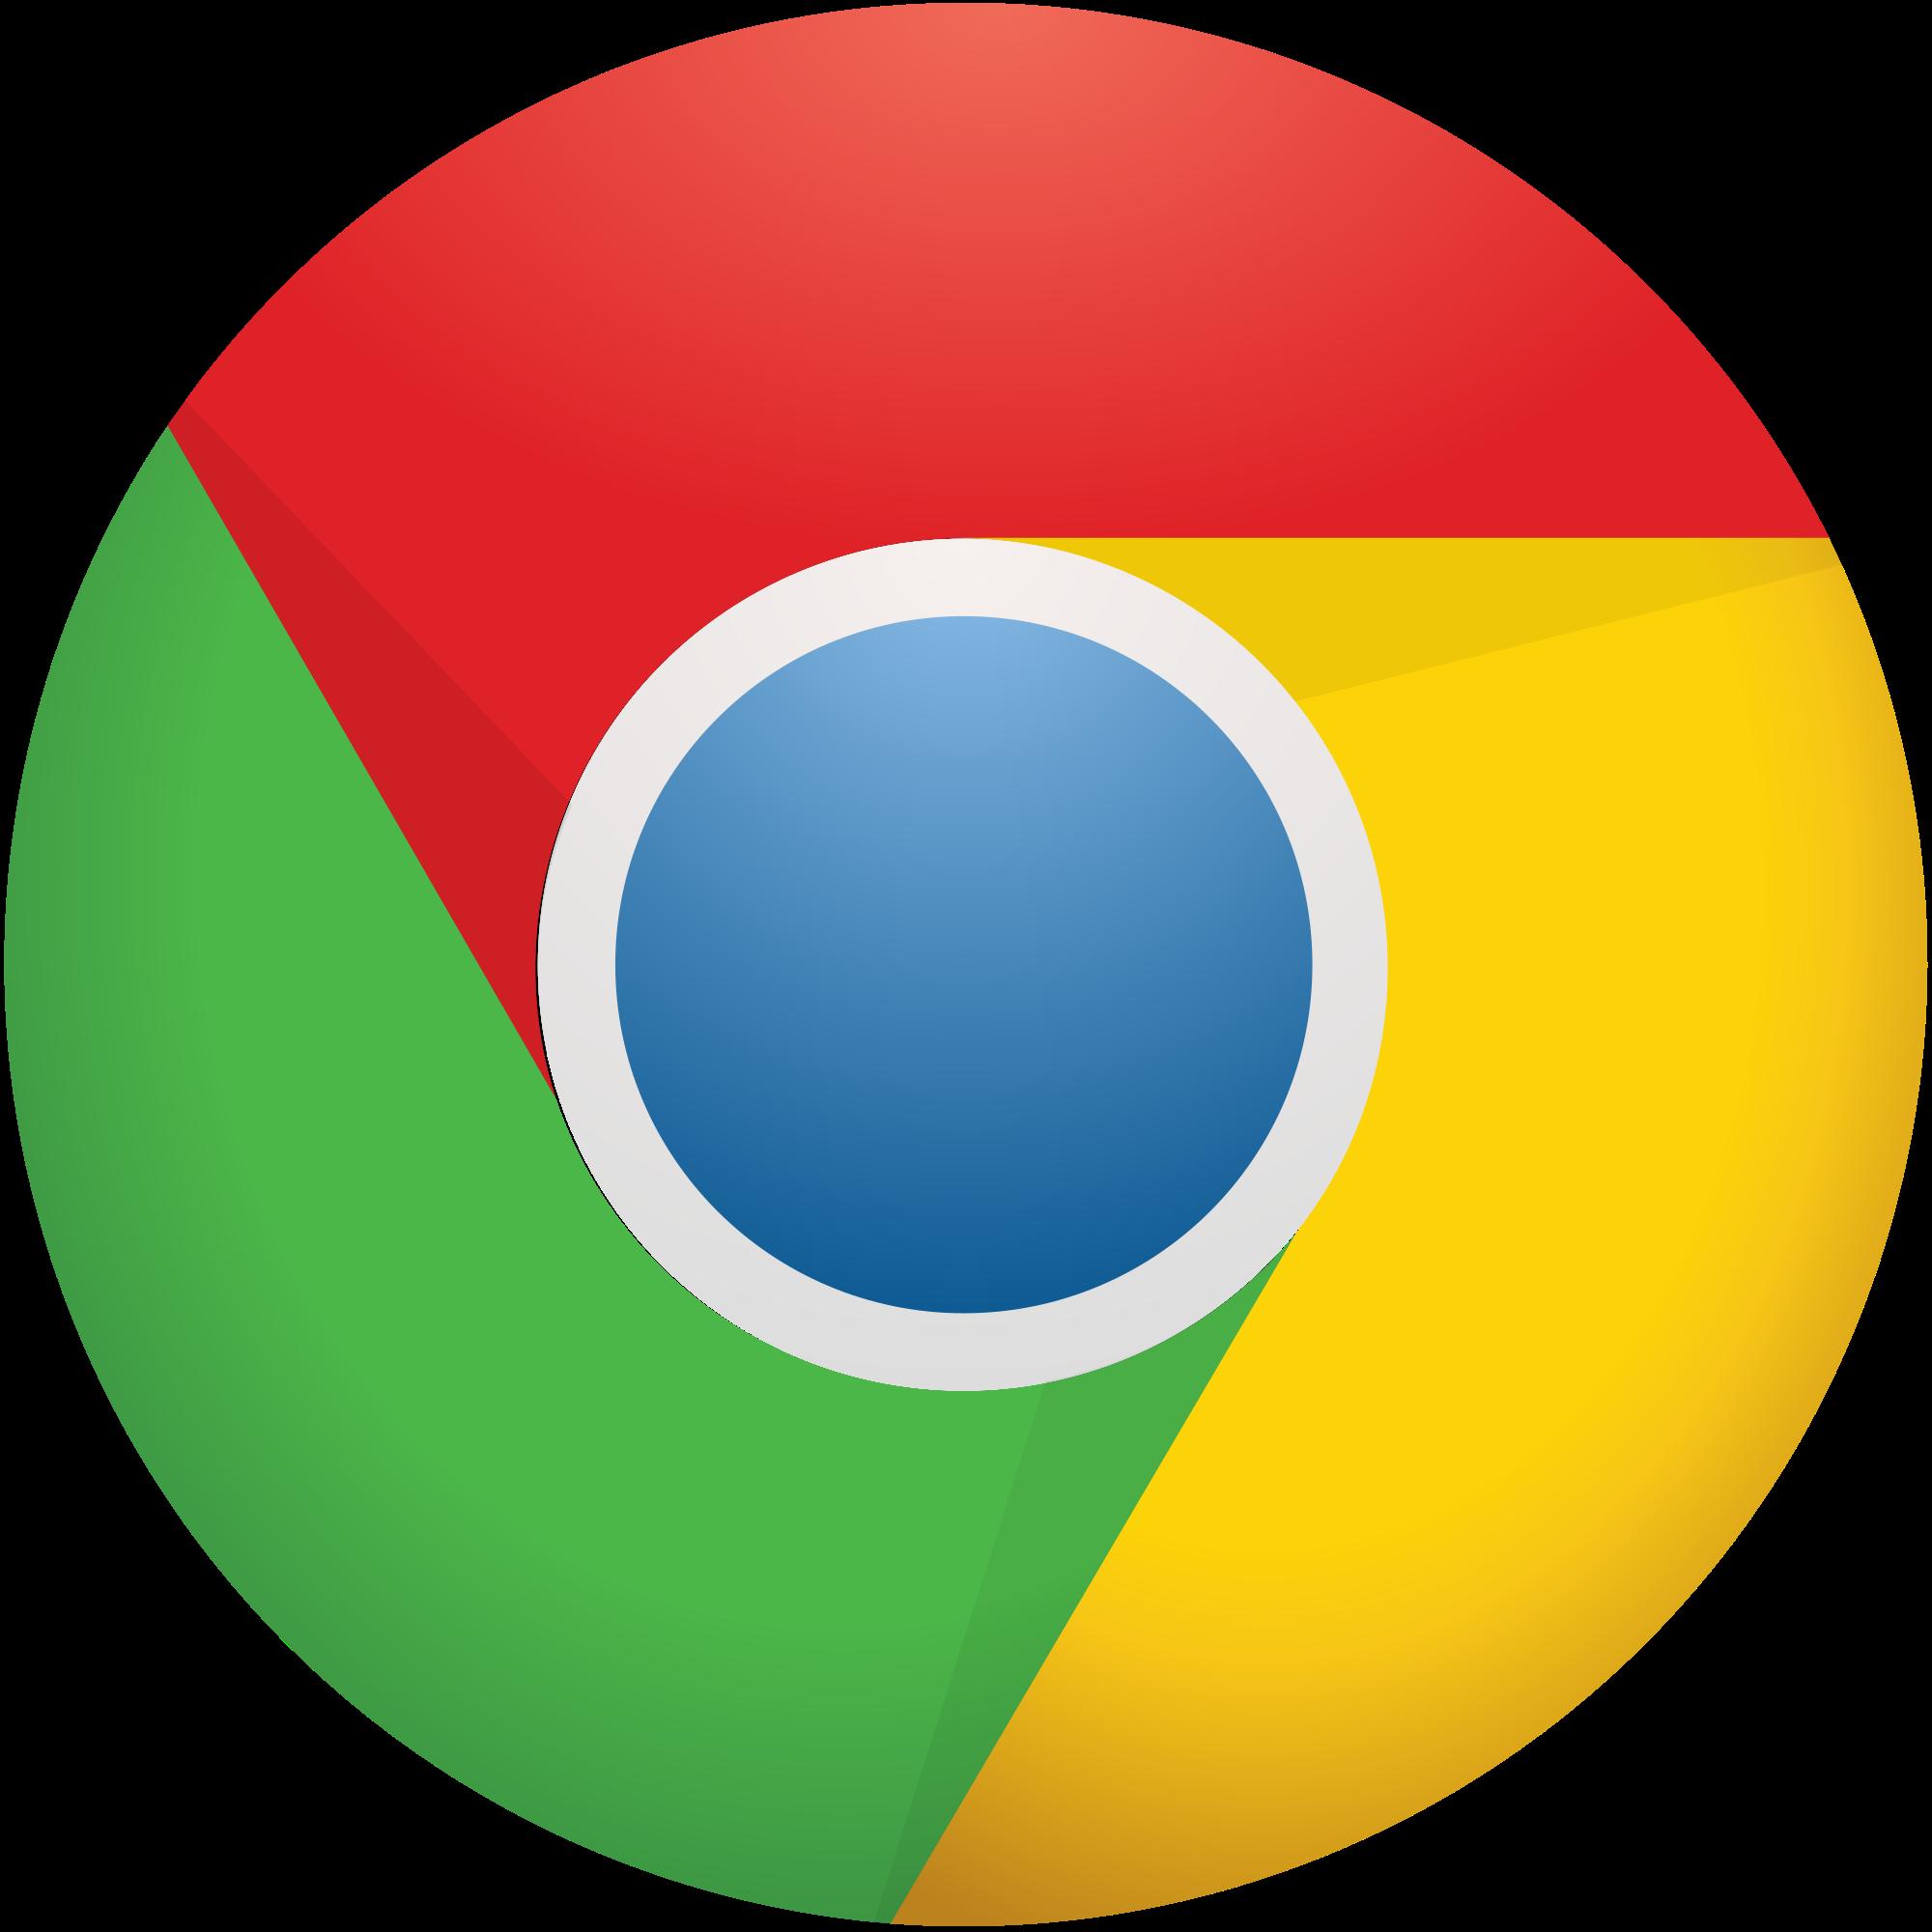 Geometry clipart icon. File google chrome svg